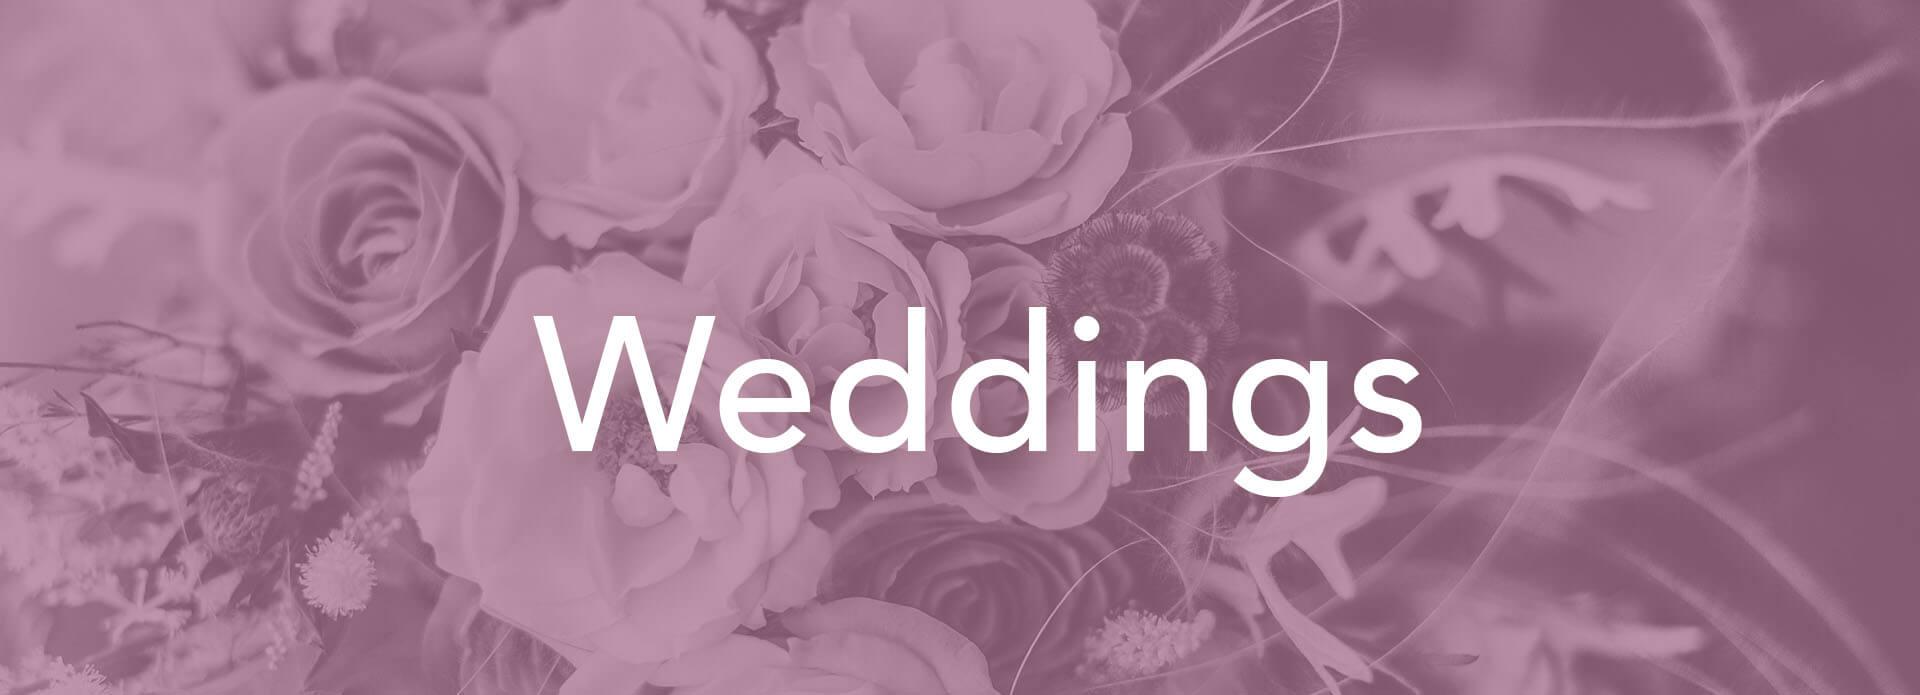 weddingsgrace